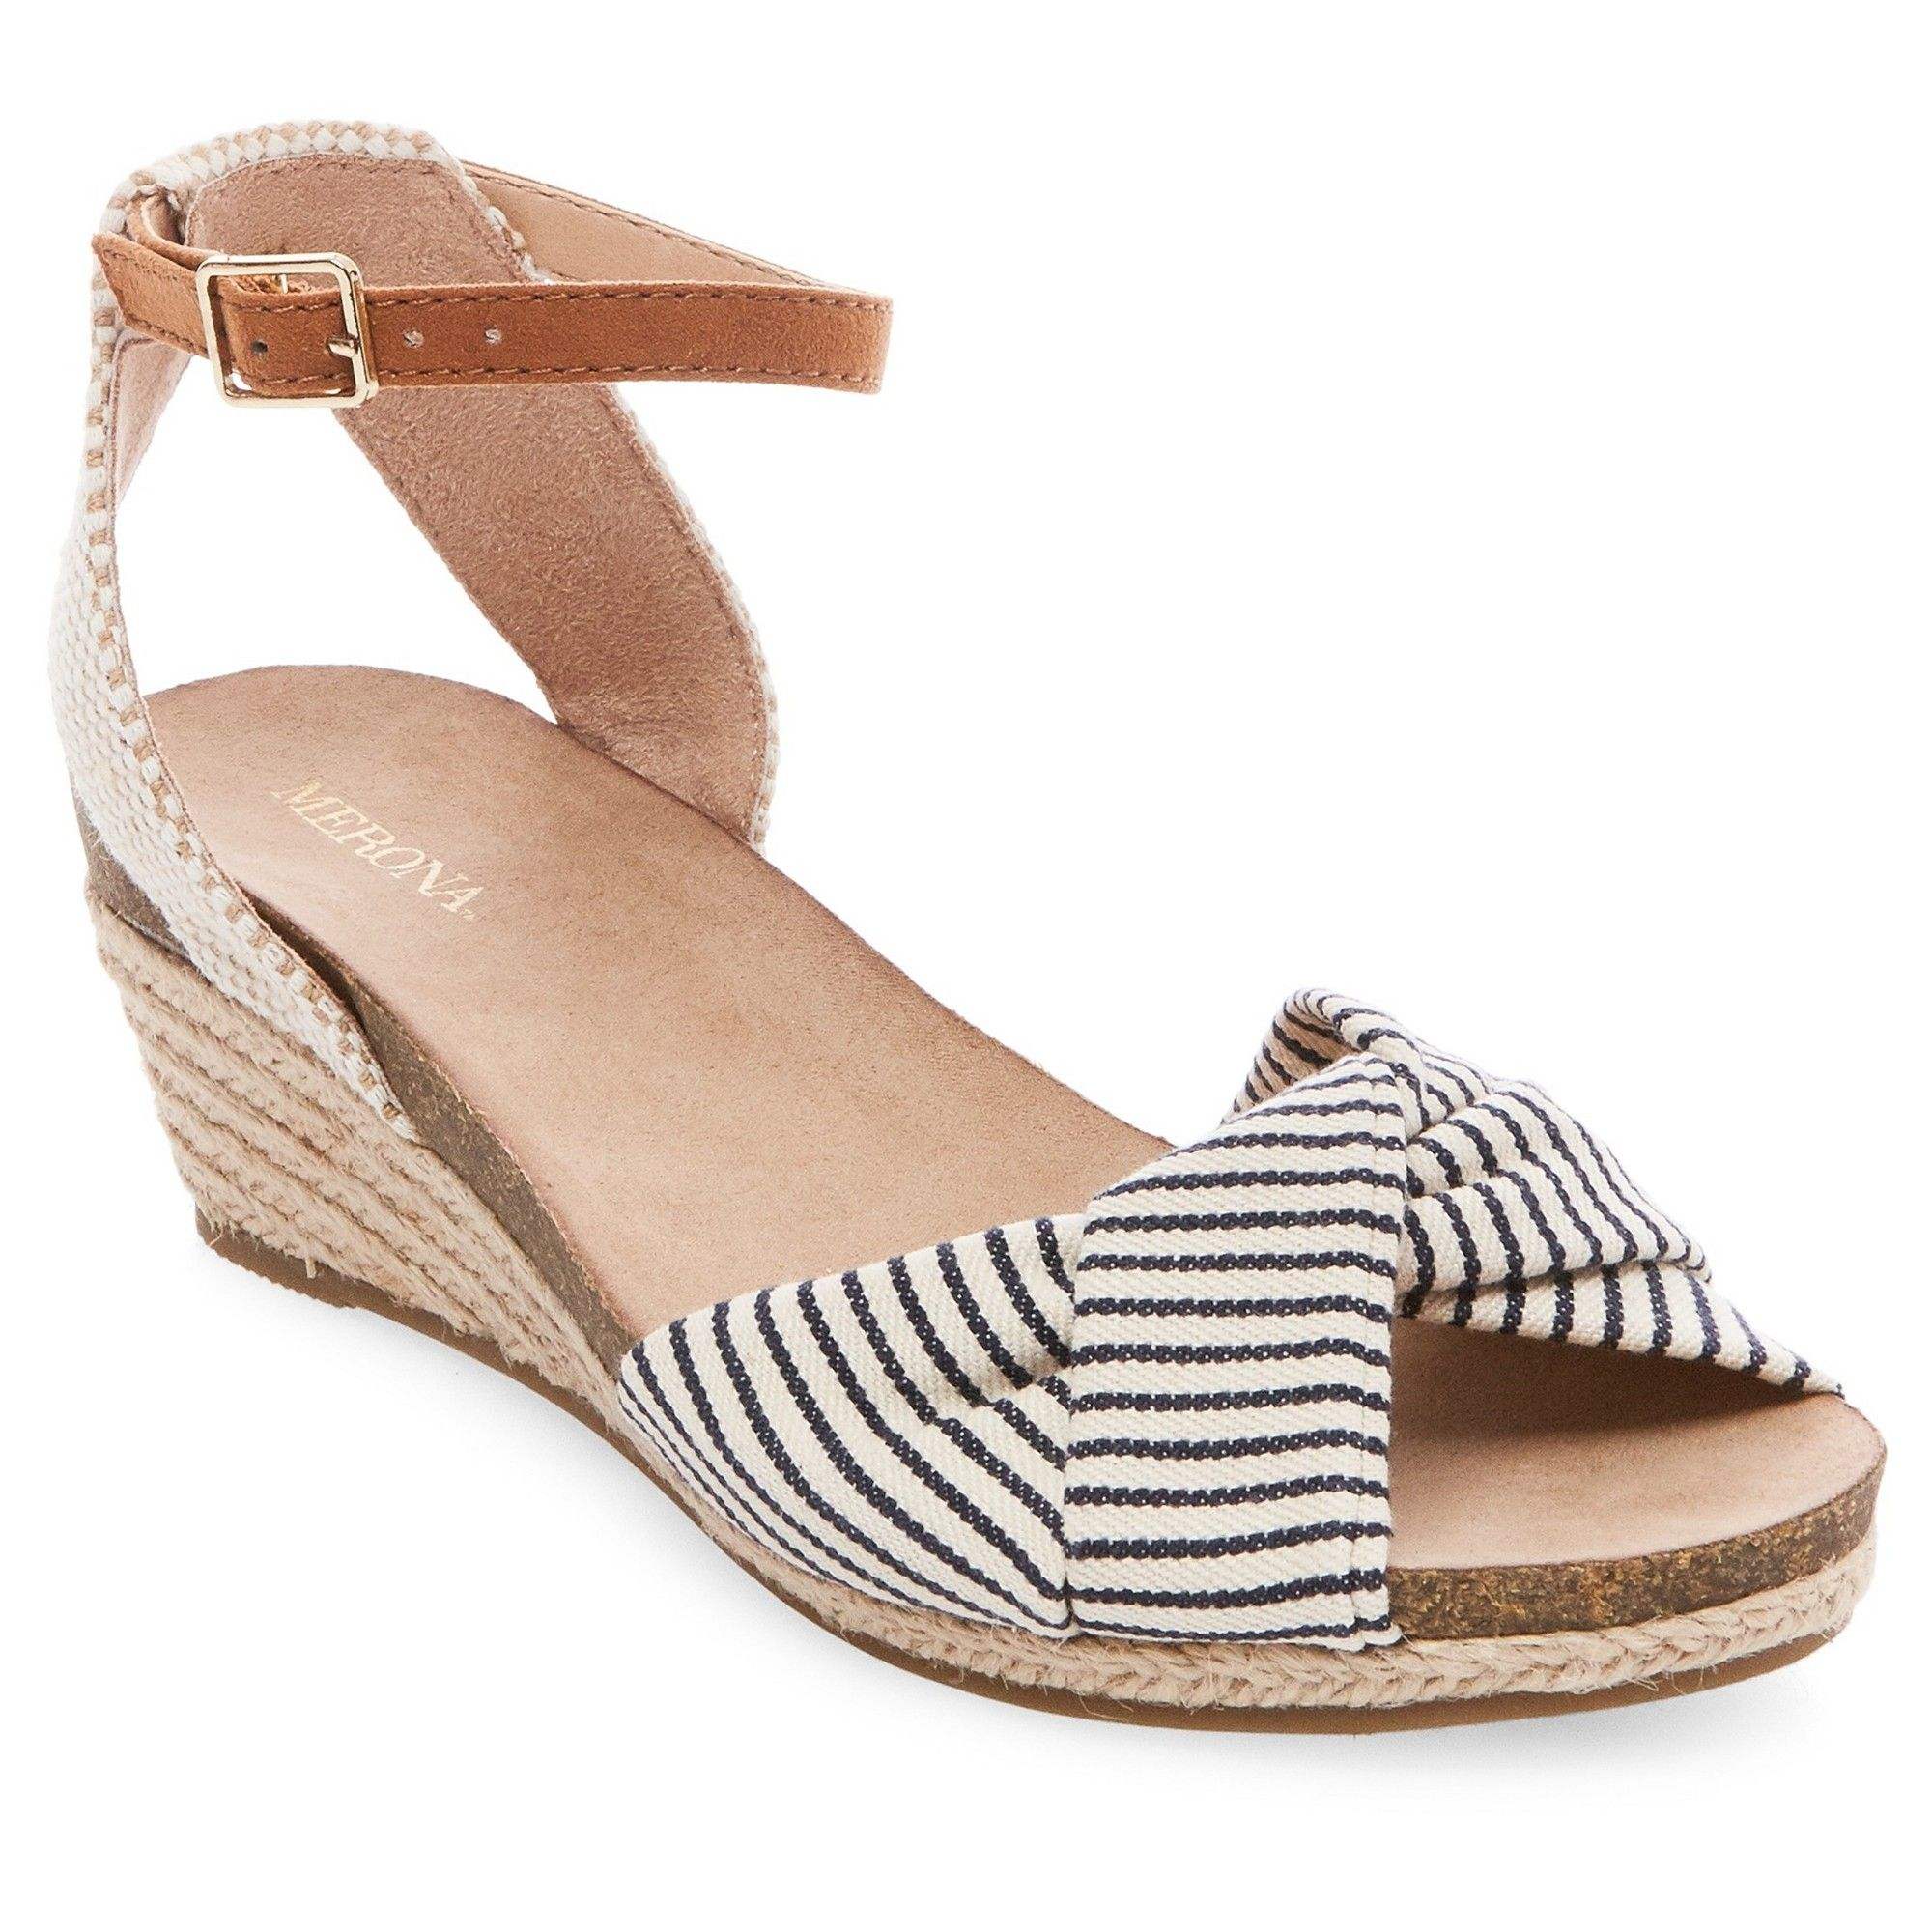 013c539059 Women's Brynn Footbed Wedge Quarter Strap Sandals - Merona Navy (Blue) 8.5